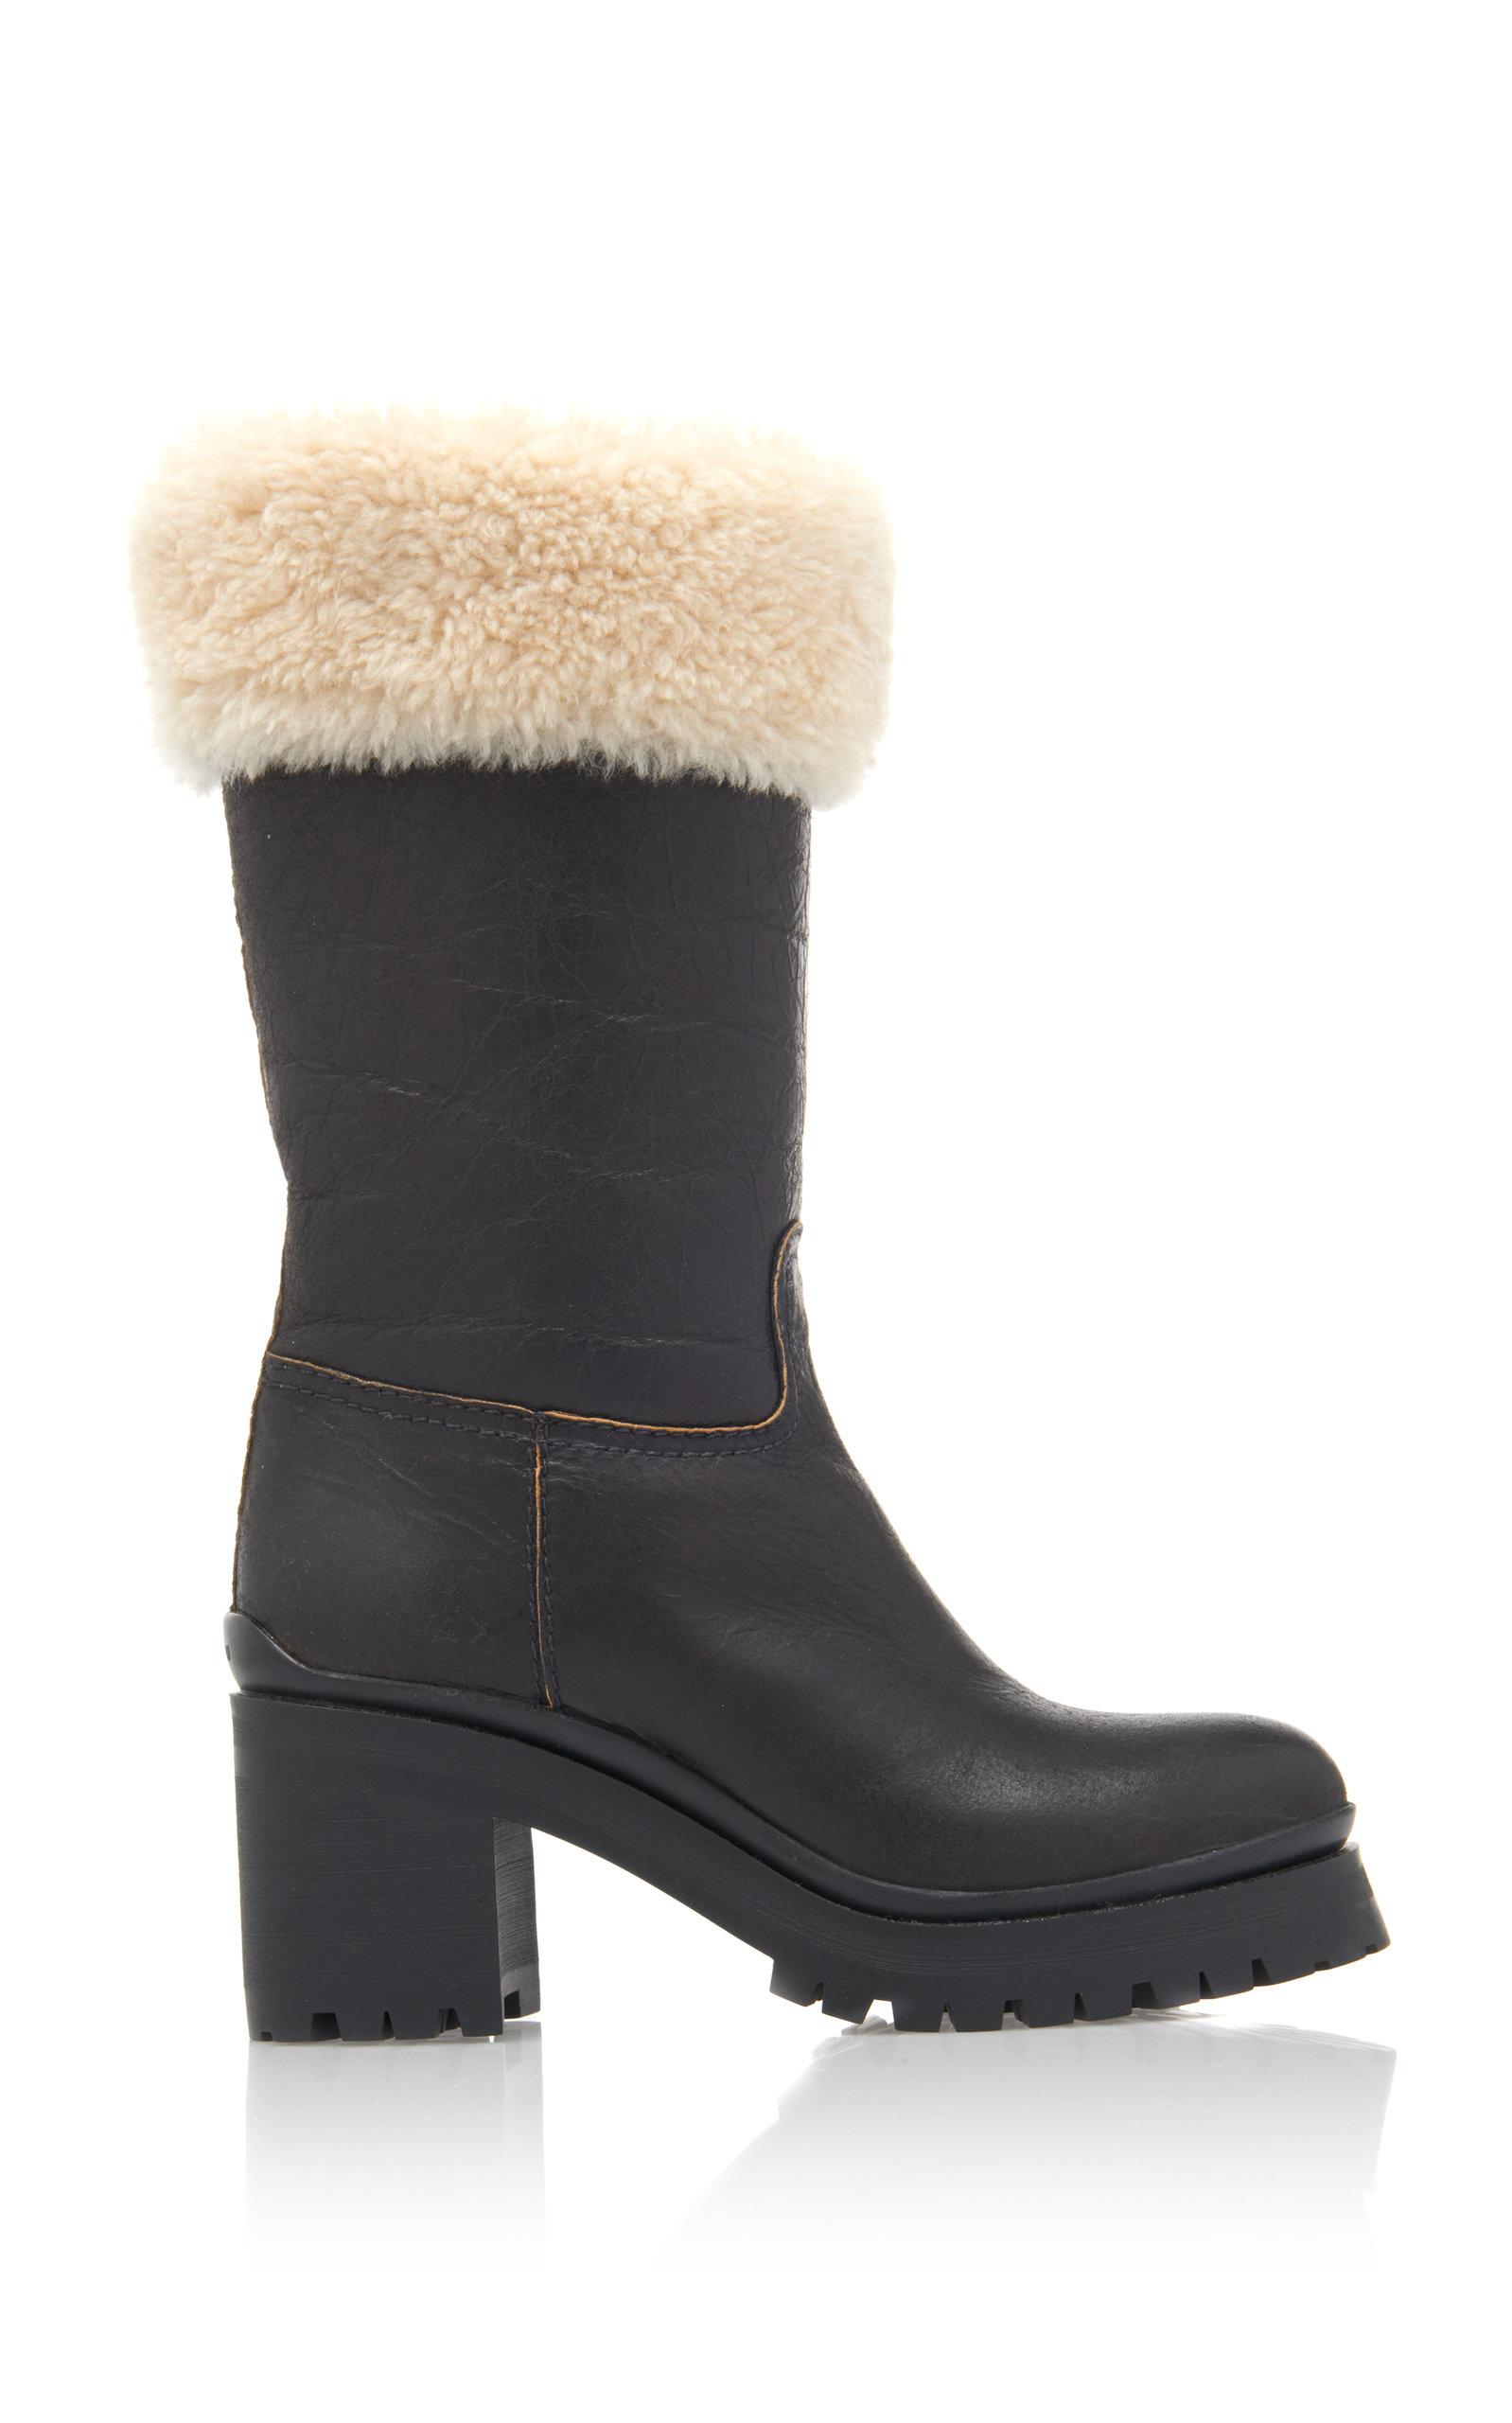 Miu Miu Black Shearling Crinkled Boots